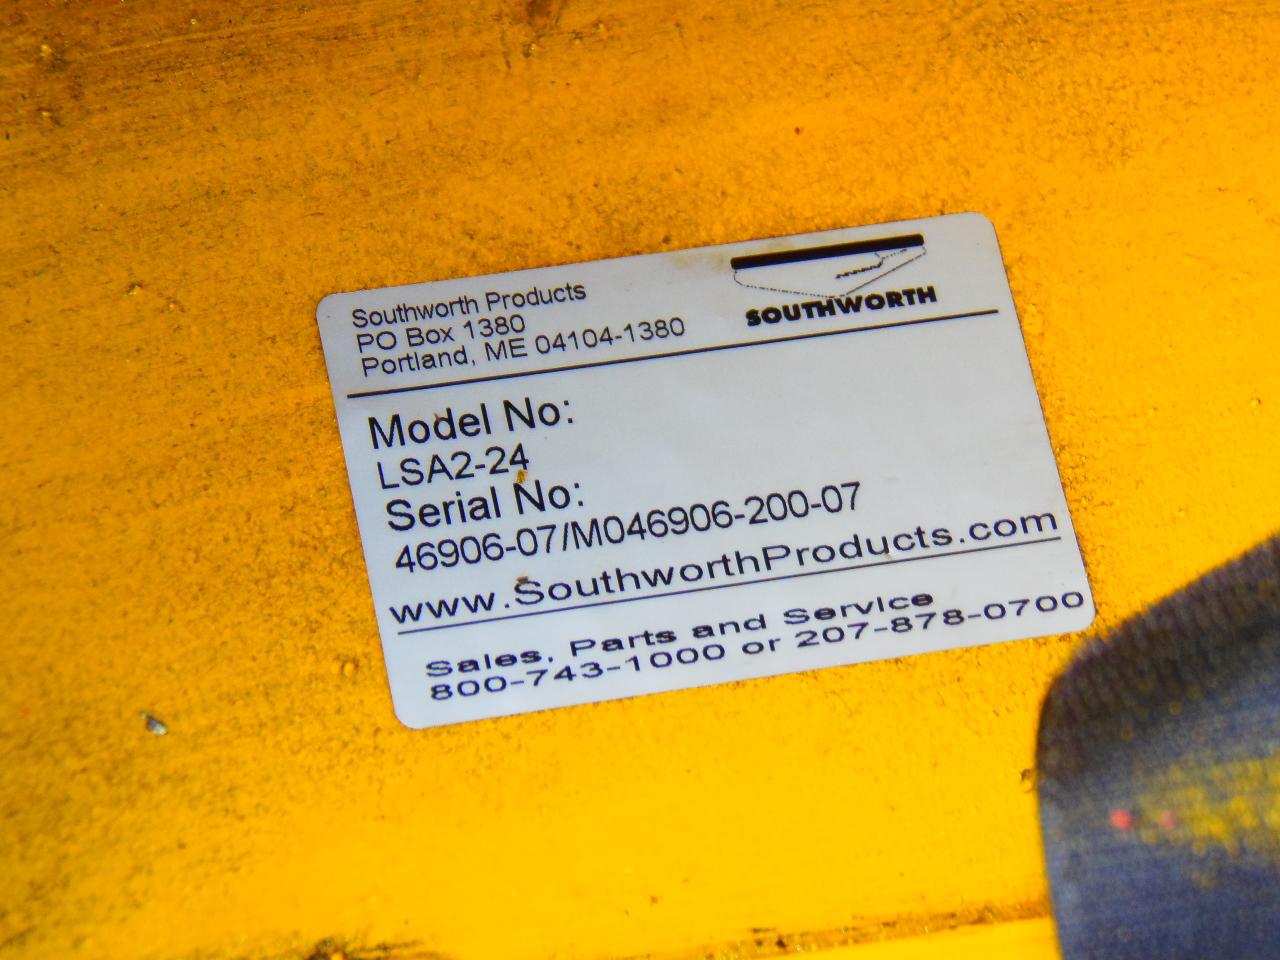 2000 LB. SOUTHWORTH AIR LIFT TABLE, MODEL LSA2-24, PNEUMATIC CROSS TRAVEL, 26 x 48 INCH TABLE, 80 PSI, WHEELS